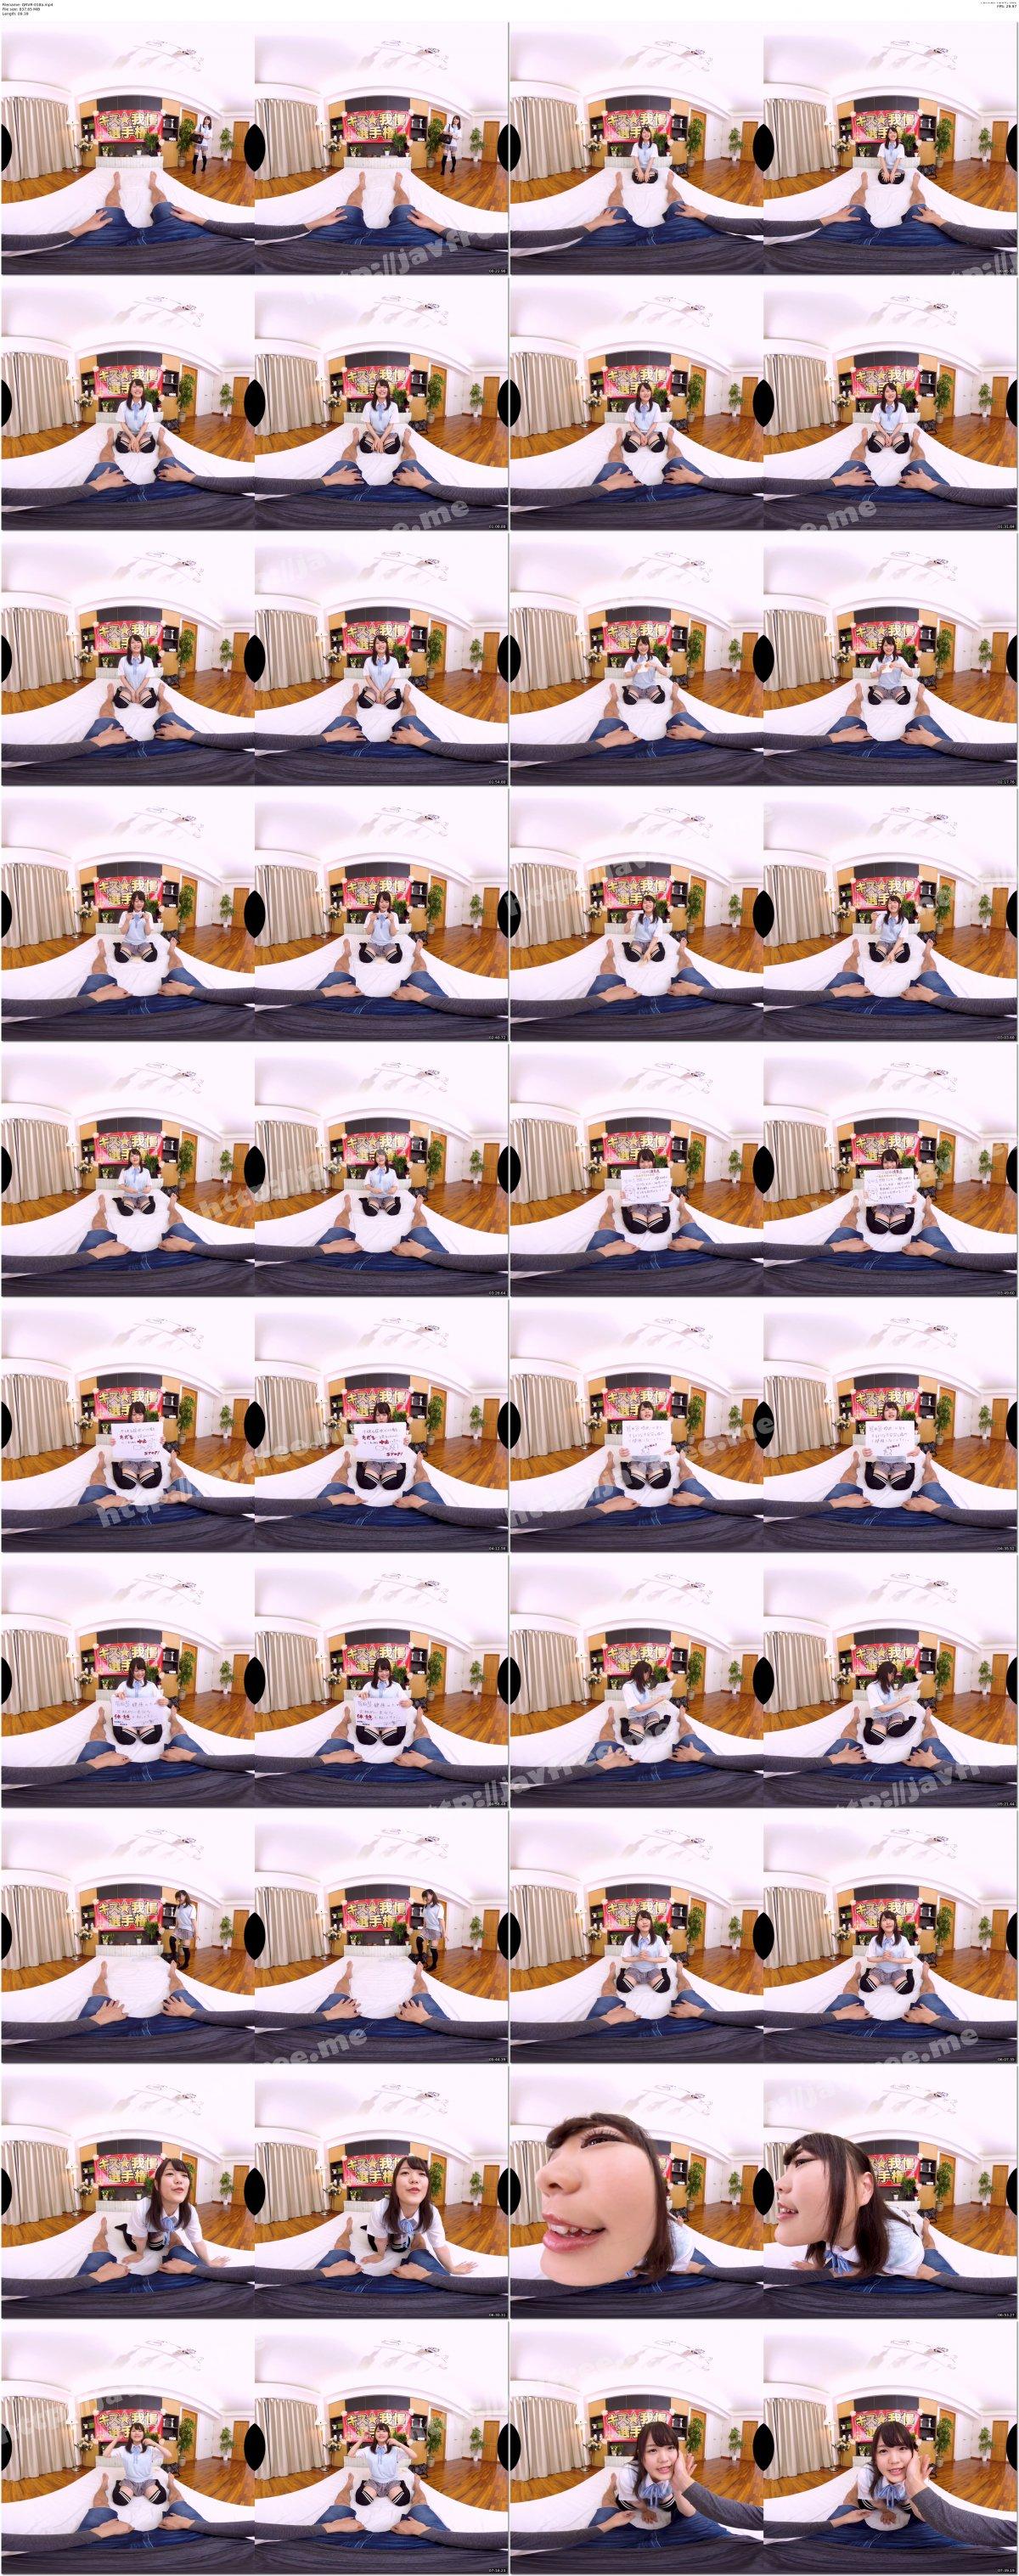 [QRVR-018] 【VR】3DVR キス★我慢決定戦 THE・DOCUMENTーザ・ドキュメントー 制限時間90分ほぼノーカット1本勝負!心を込めたガチ誘惑!最後まで我慢出来たらゴム無し生★中出し! 水卜麻衣奈 Vol.003